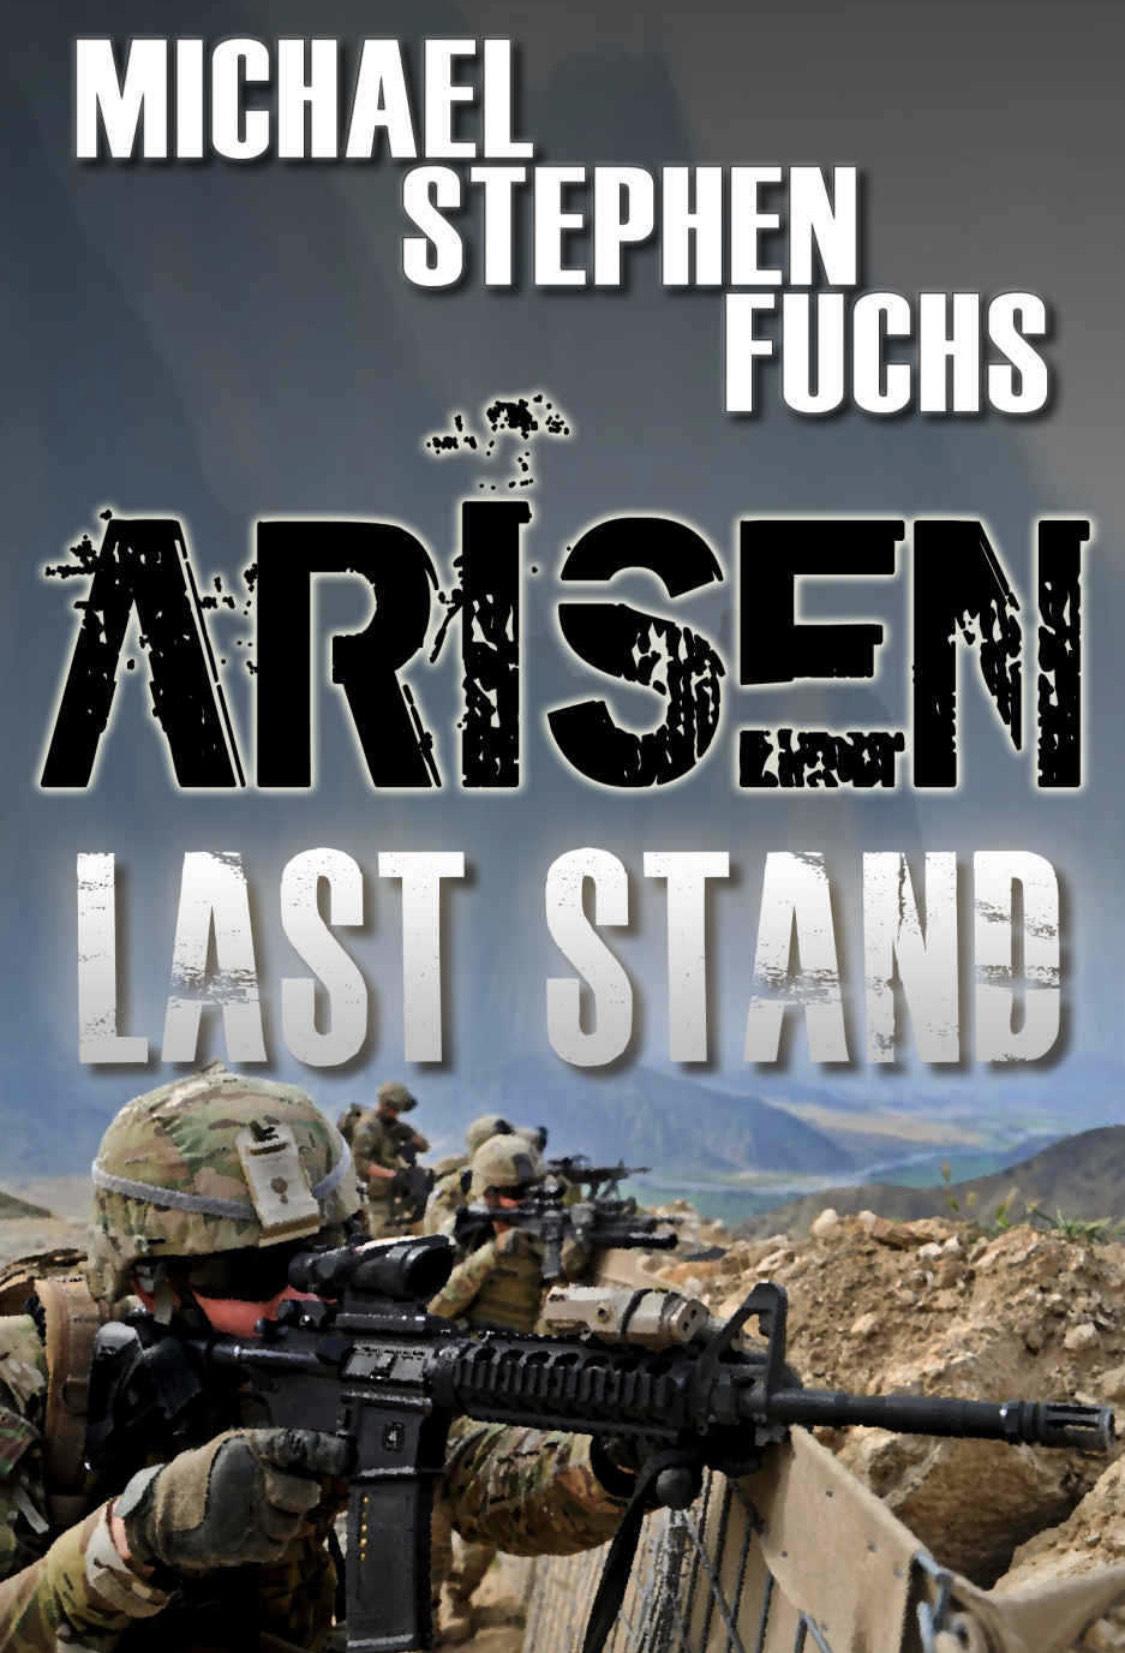 Arisen Last Stand (Michael Stephen Fuchs) - ebook free on Amazon